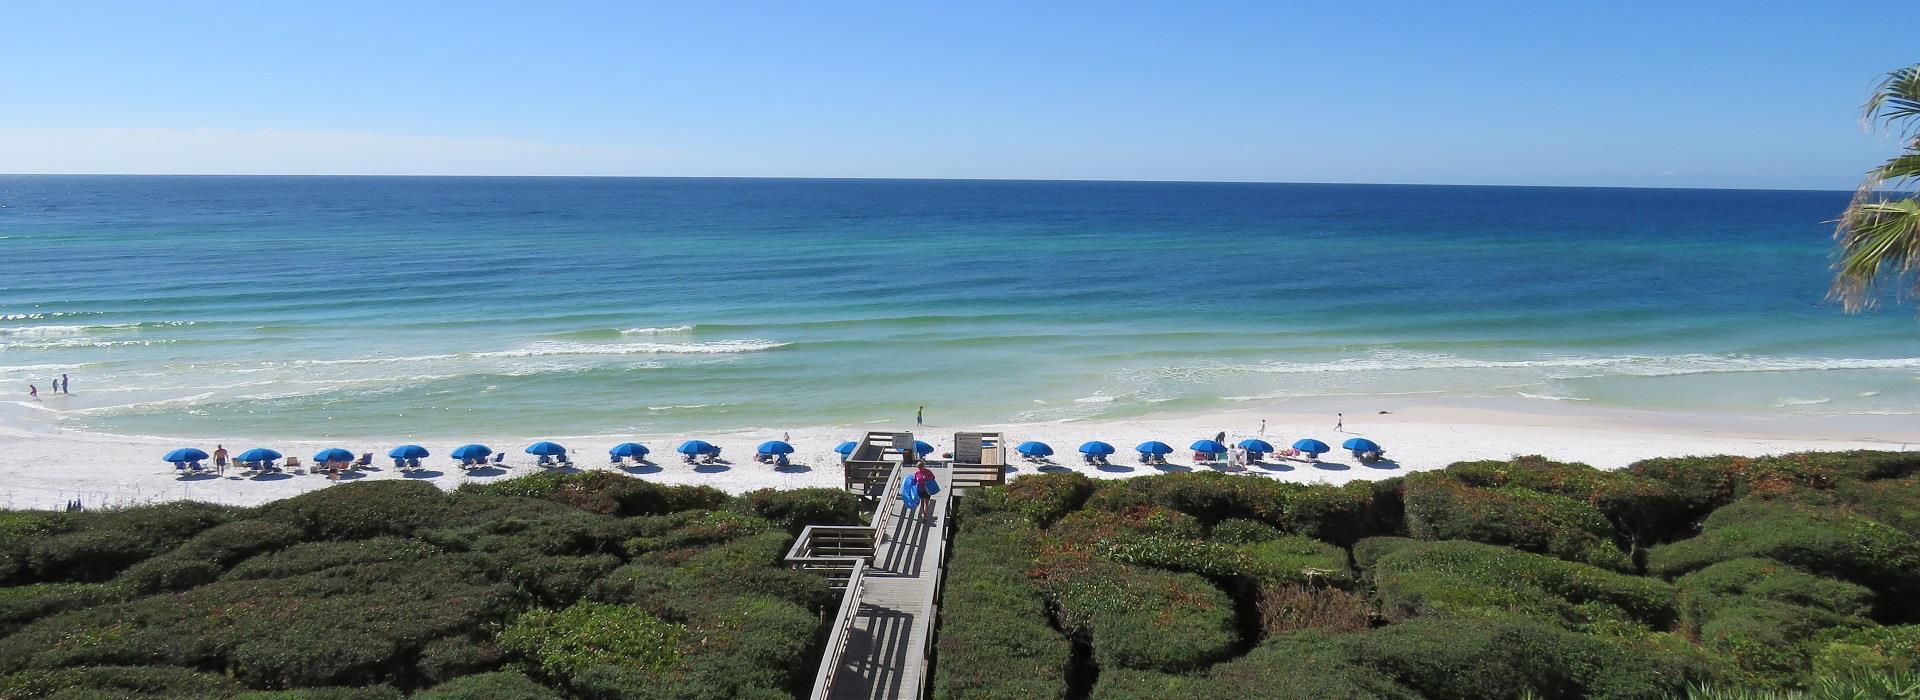 Garrett Realty and Seagrove Beach Florida on 30A